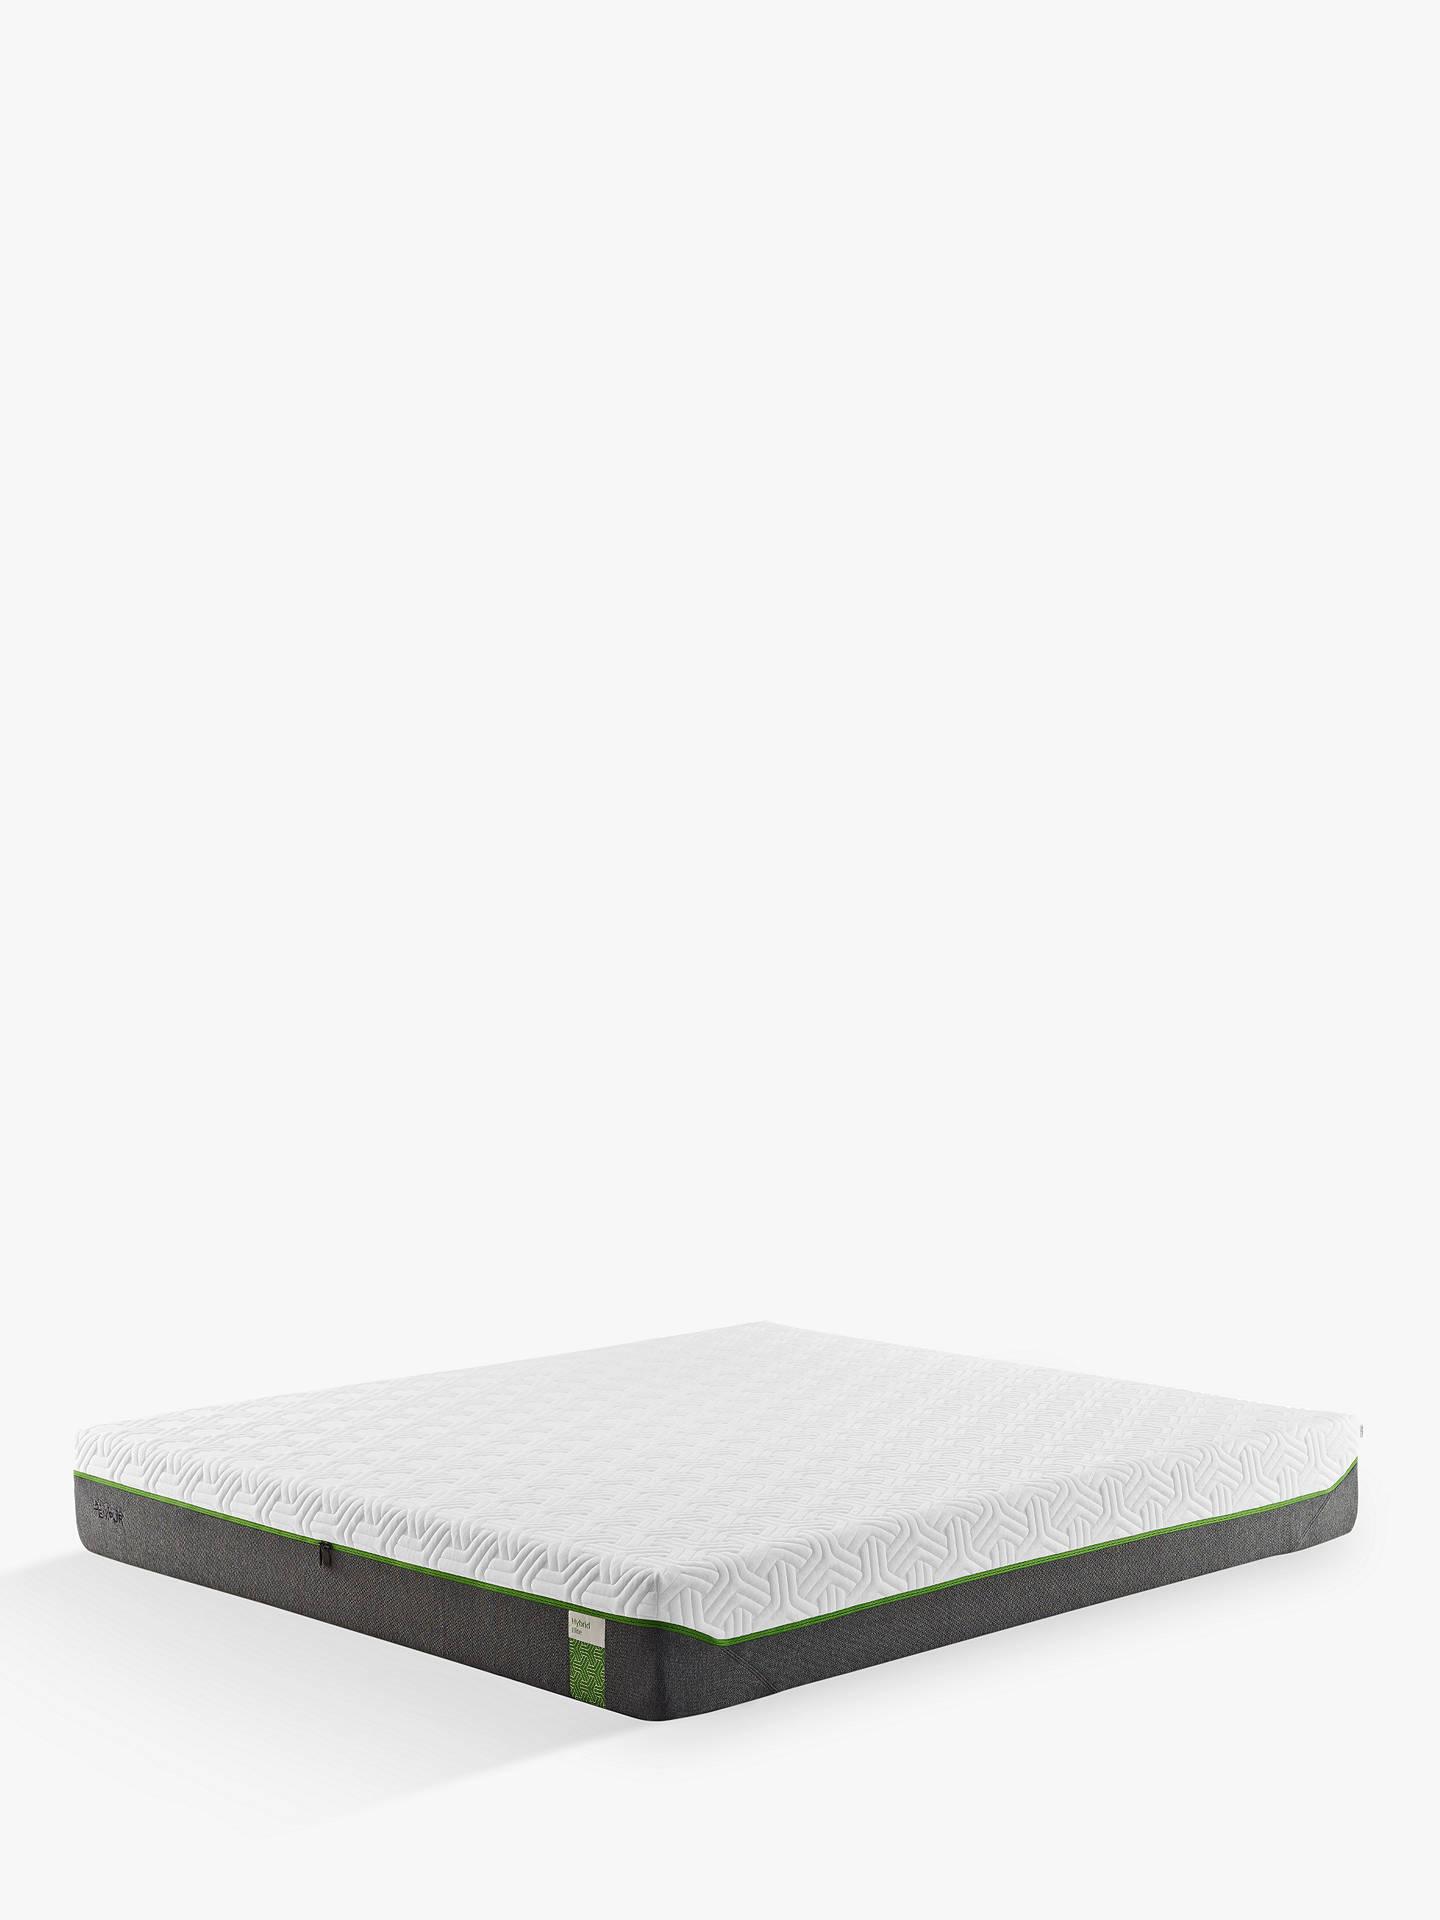 free shipping 5115f 8245f Tempur Hybrid Elite 25 Pocket Spring Memory Foam Mattress, Medium, Small  Double